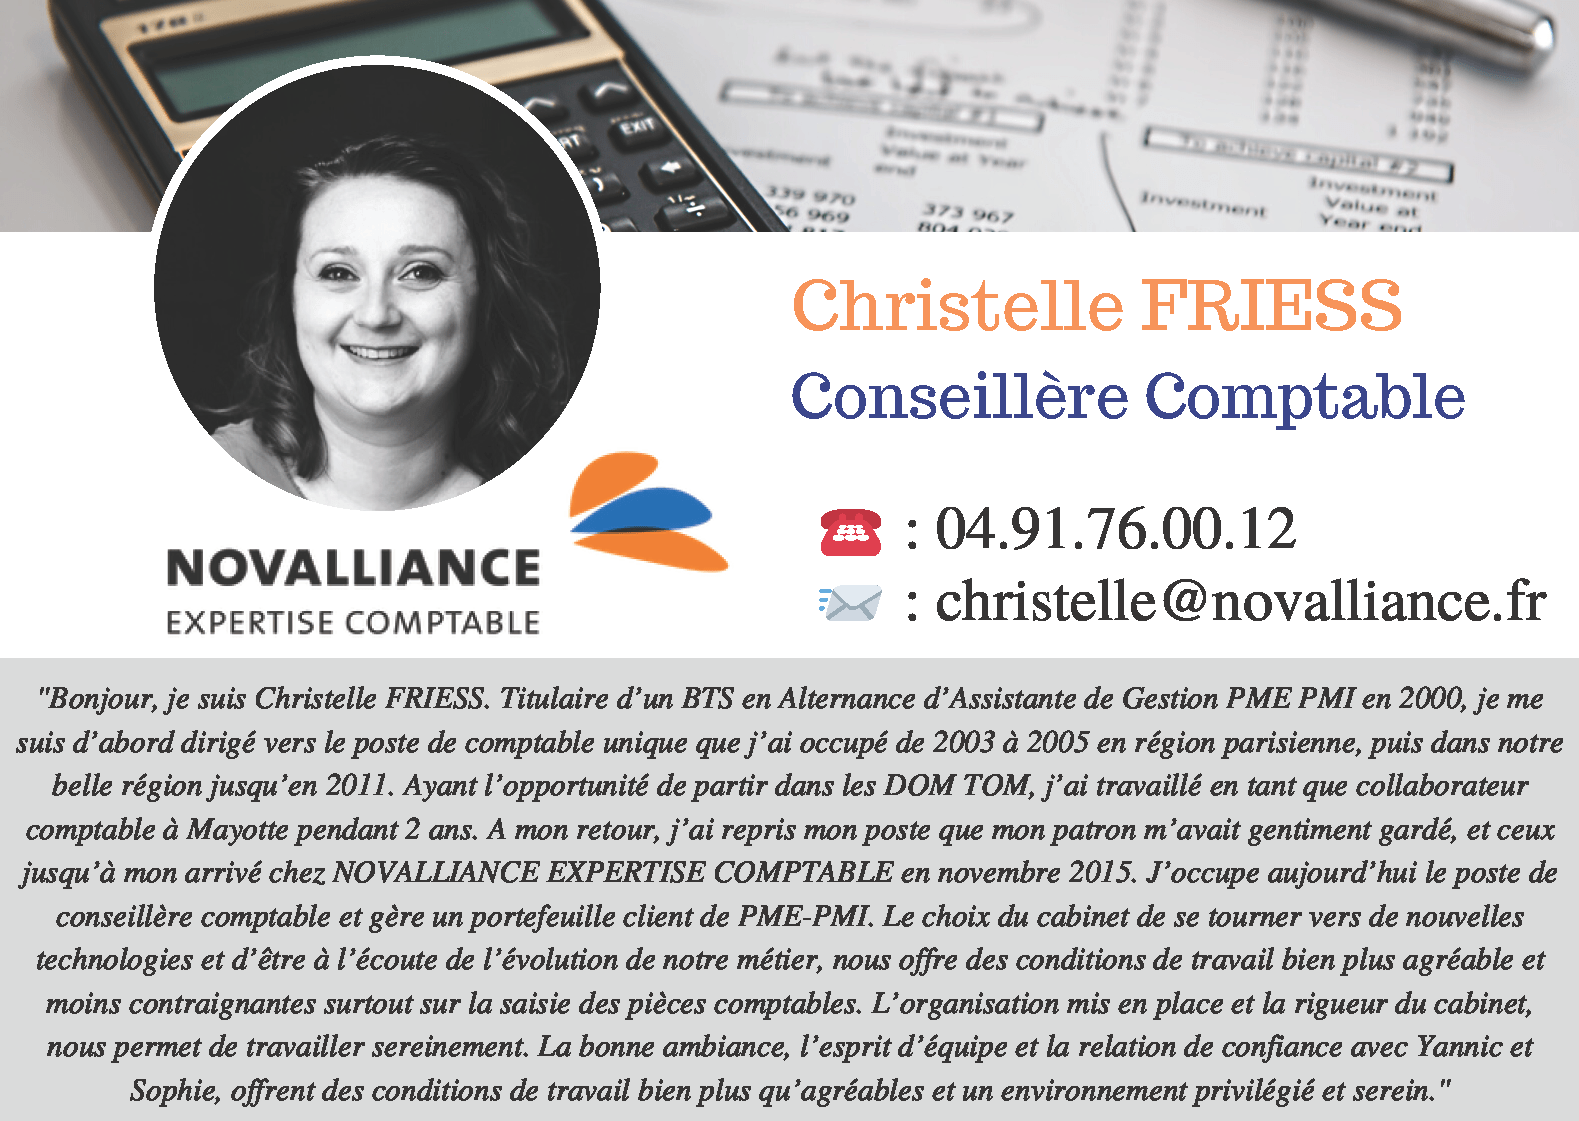 Fiche Conseillère Comptable Christelle FRIESS